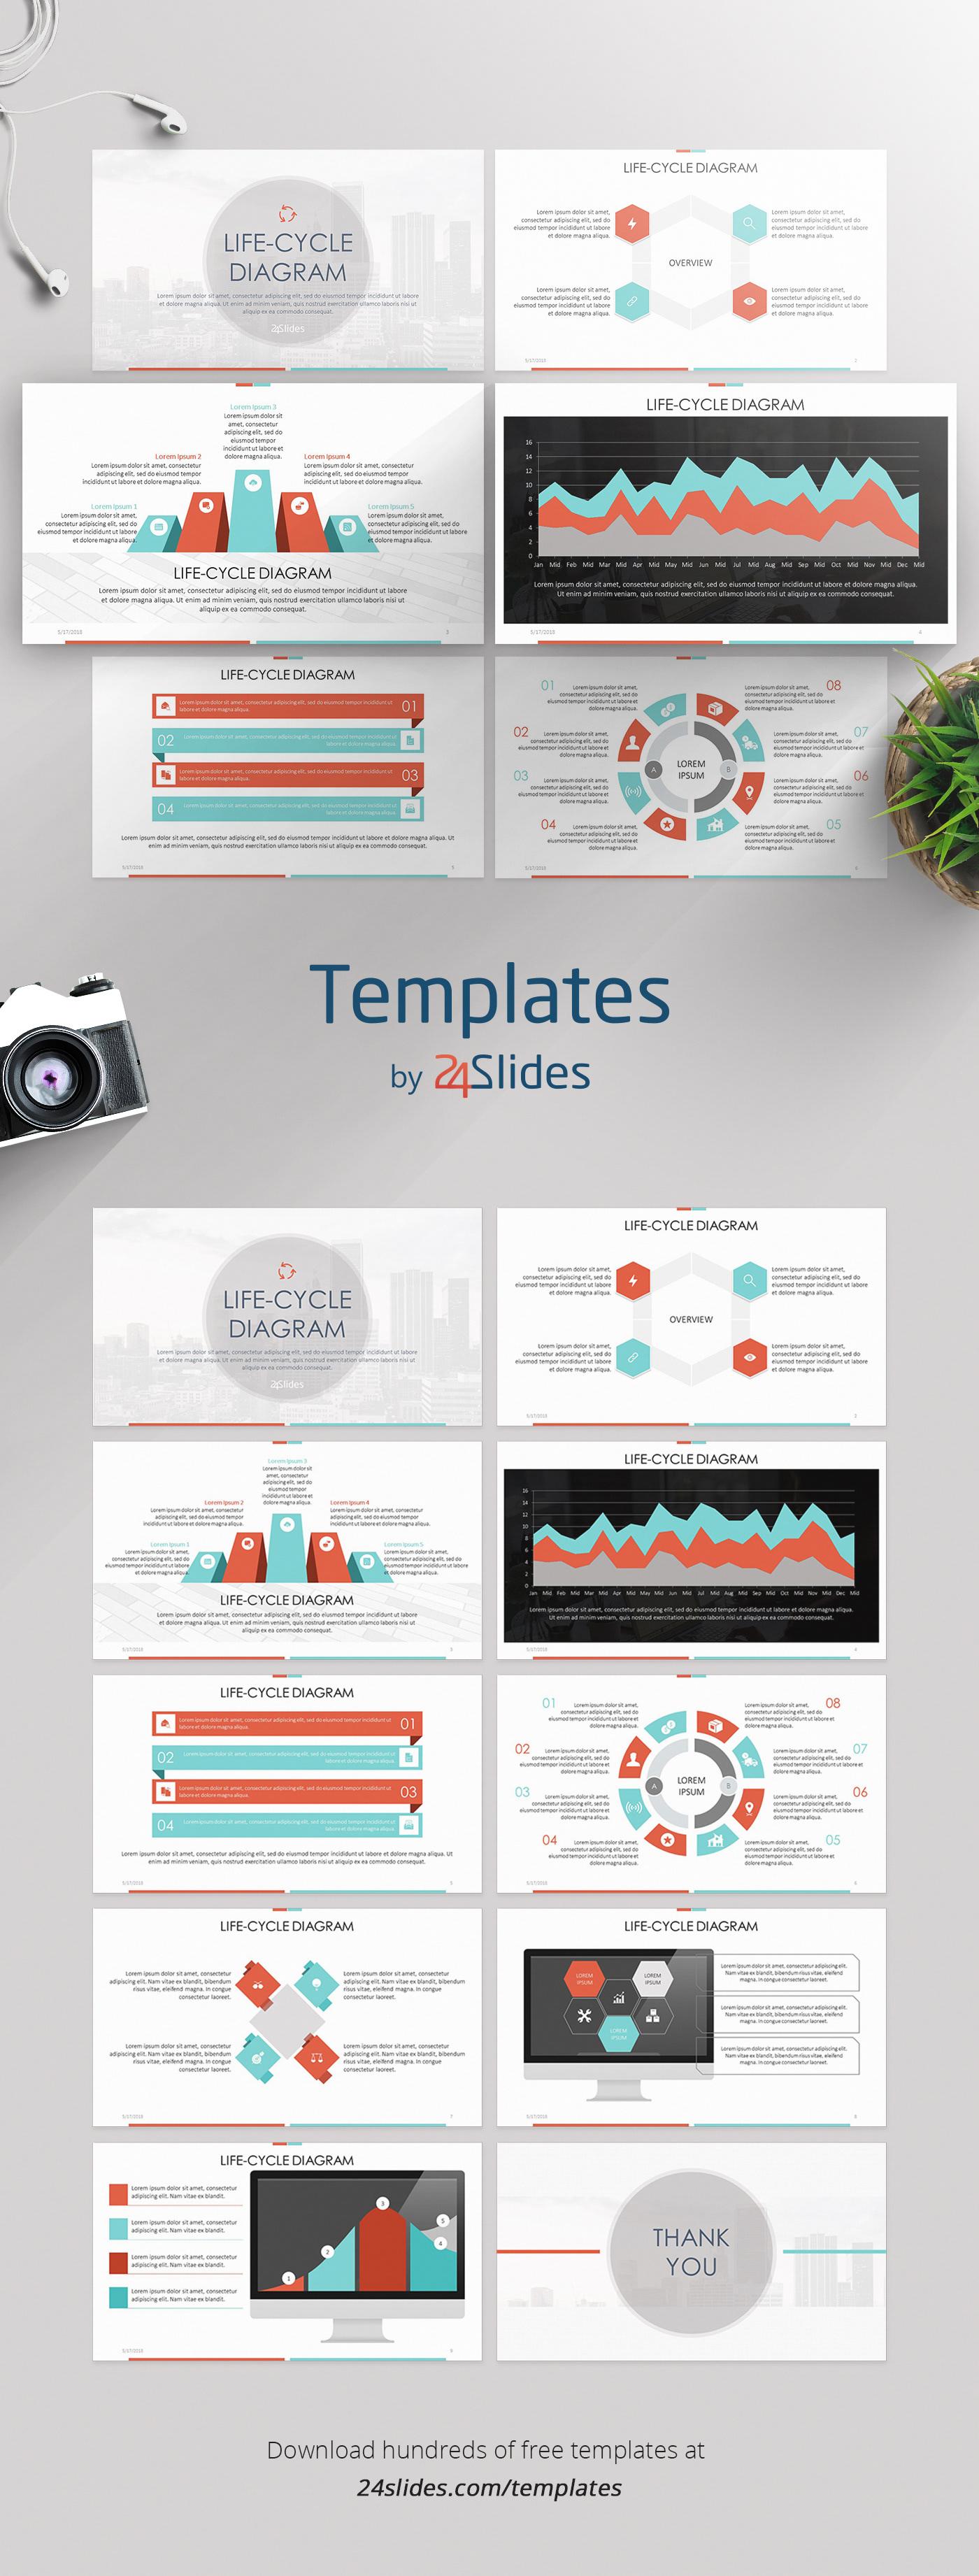 Business presentation presentation templates corporate branding Free Template